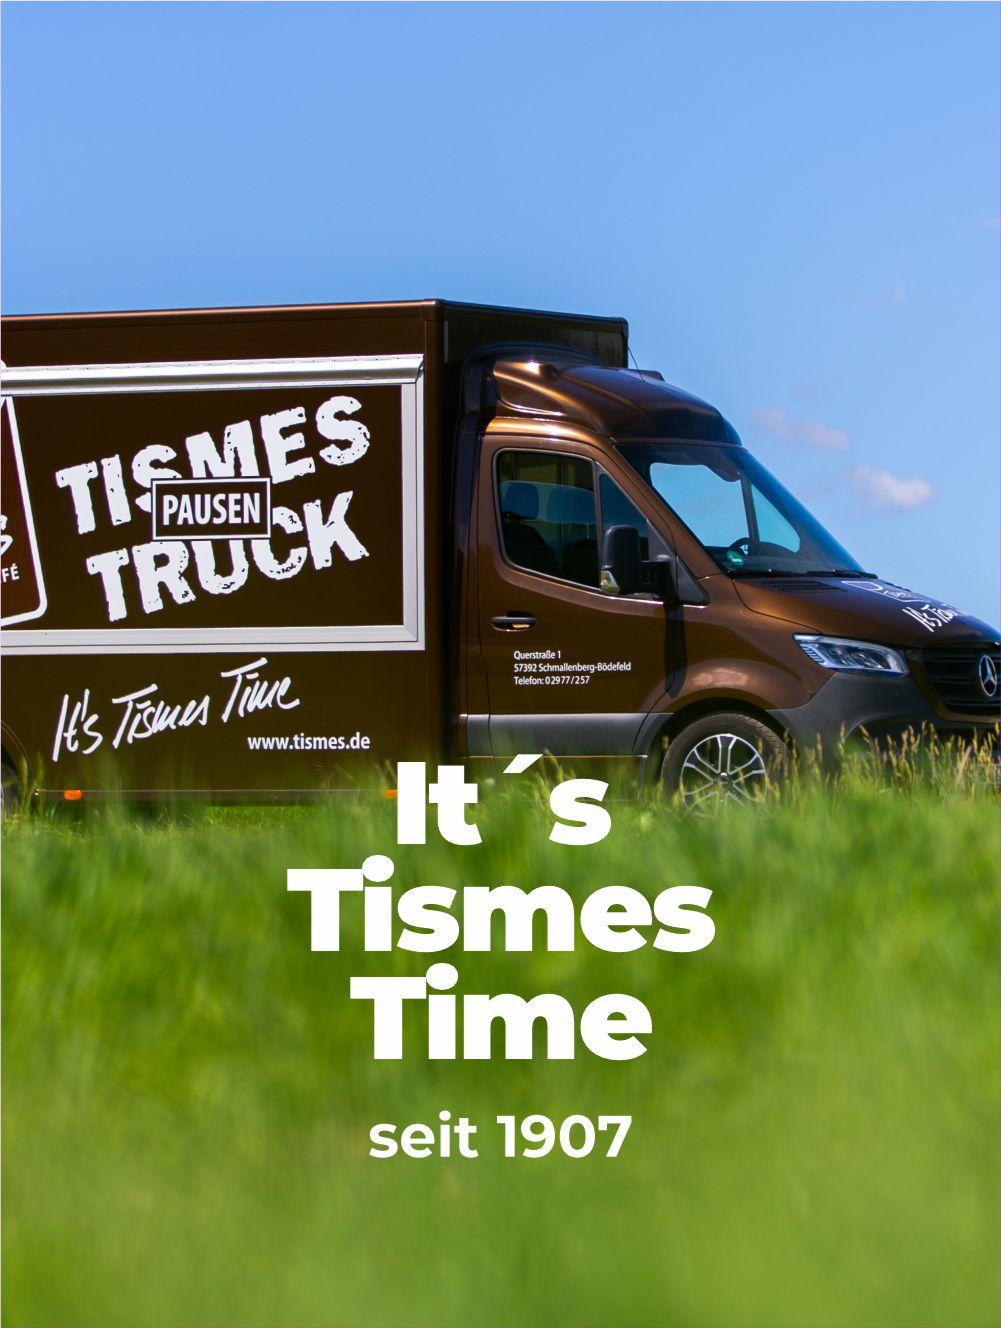 tismes_truck_slider_003_xs